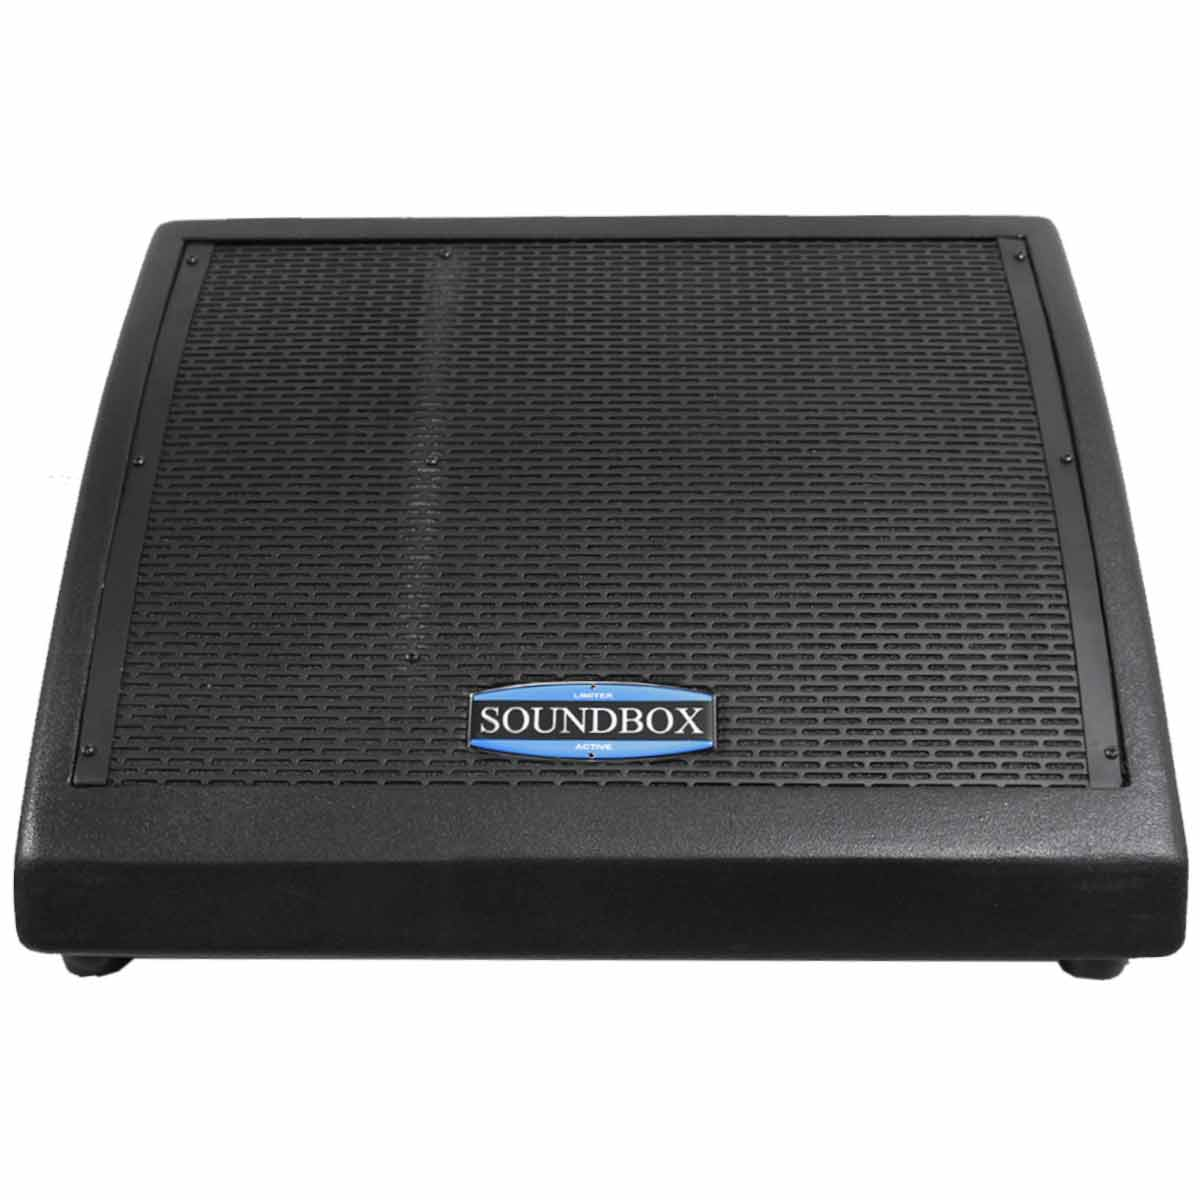 Monitor Ativo Fal 12 Pol 500W - MS 12 SoundBox